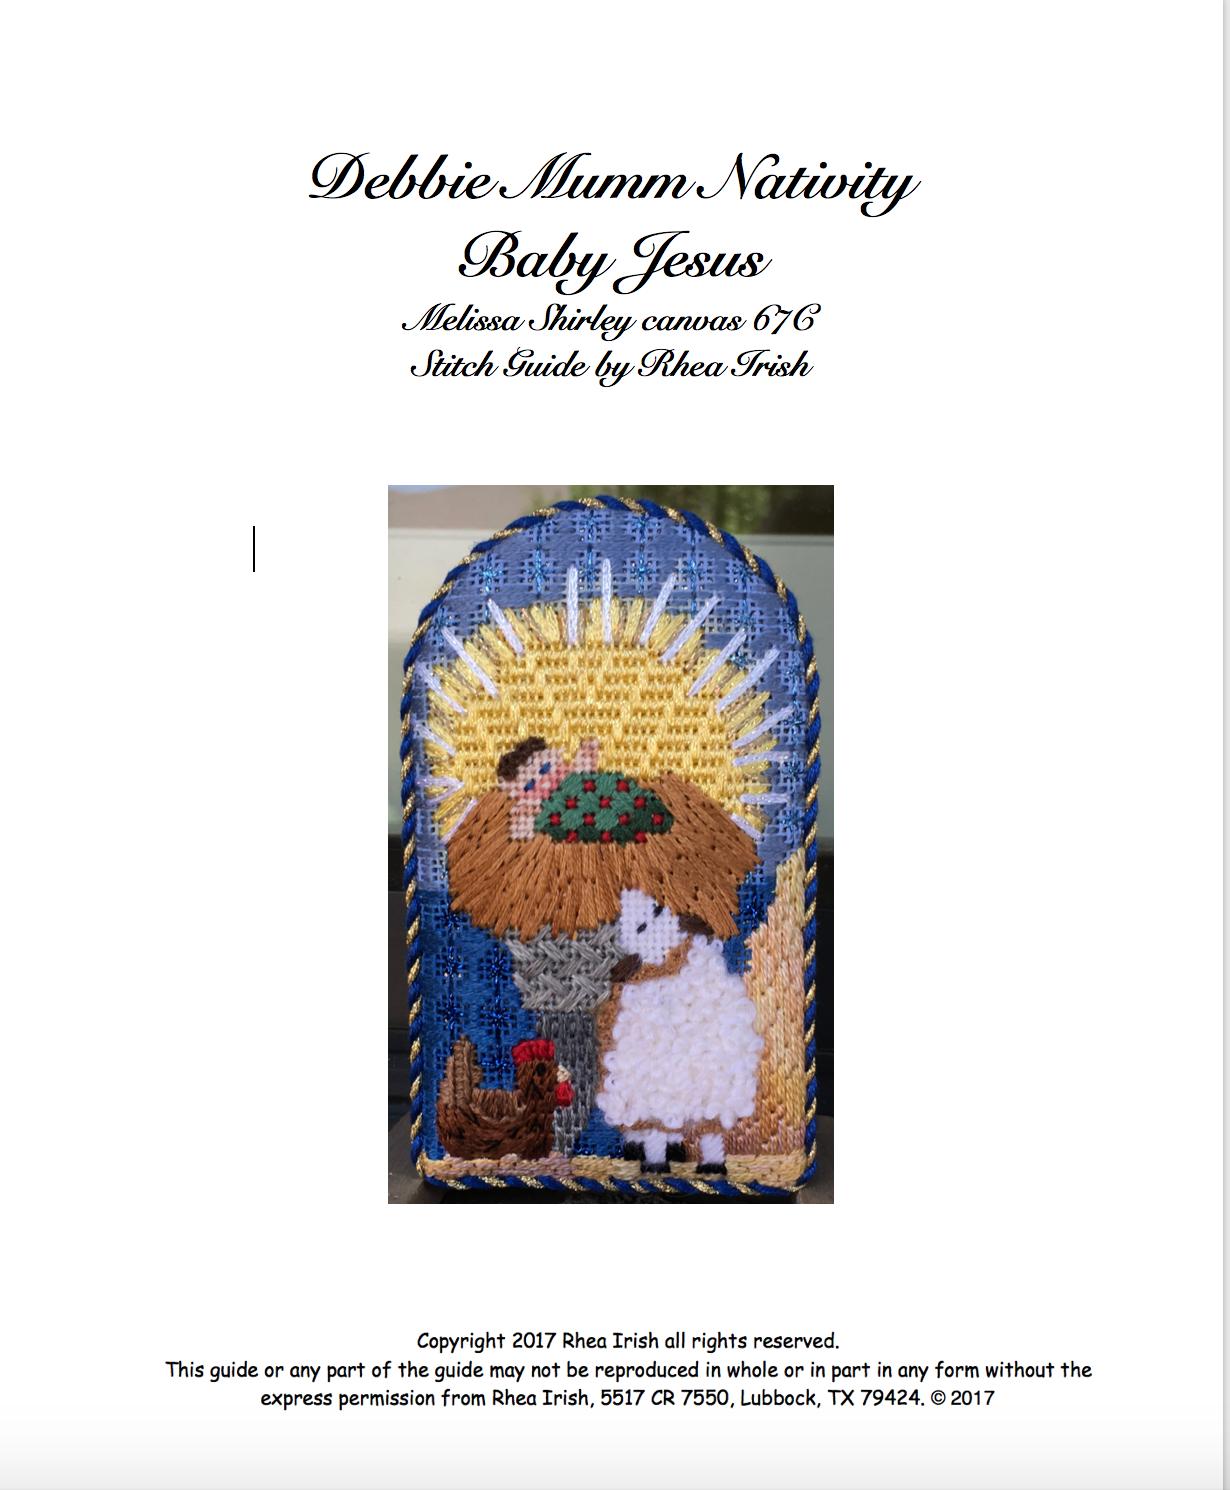 DebbieMumm Nativity-Baby Jesus.png